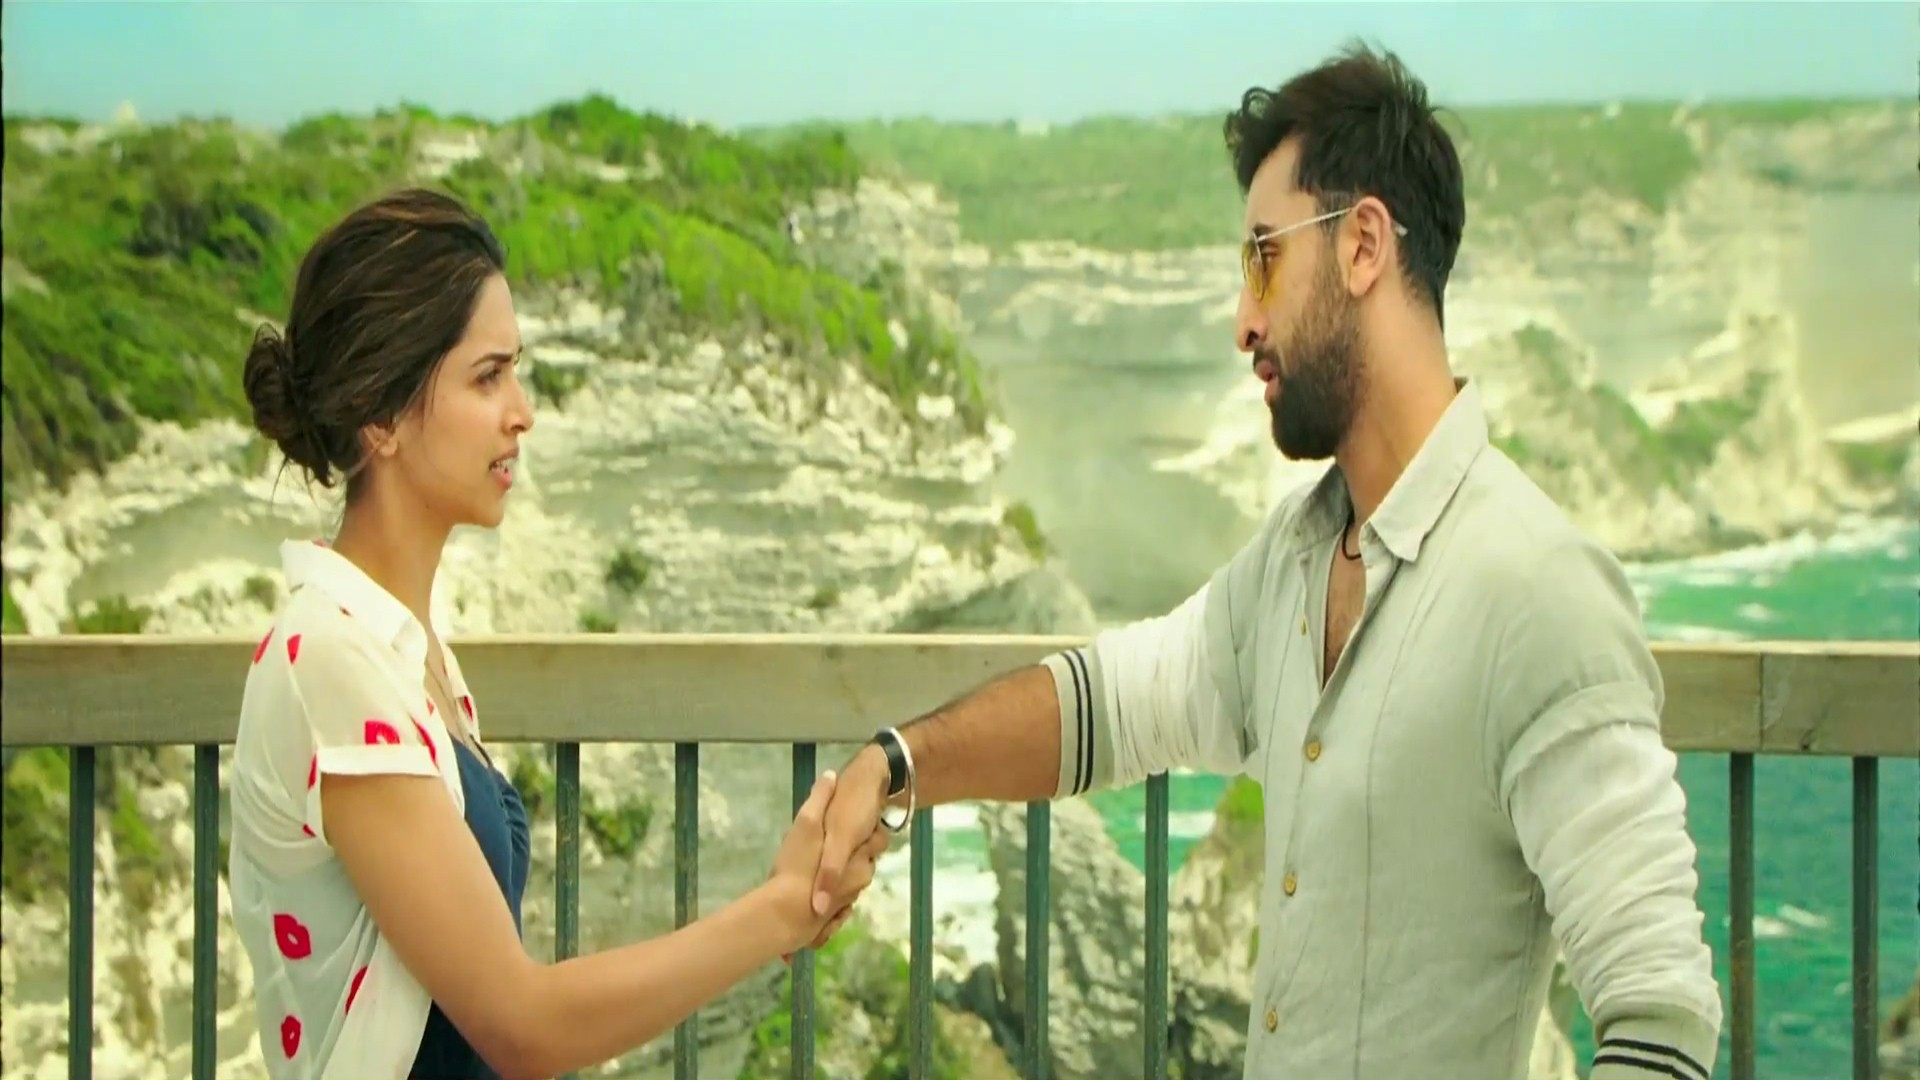 Ranbir-Kapoor-and-Deepika-Padukone-in-Tamasha-Movie-HD-Photos